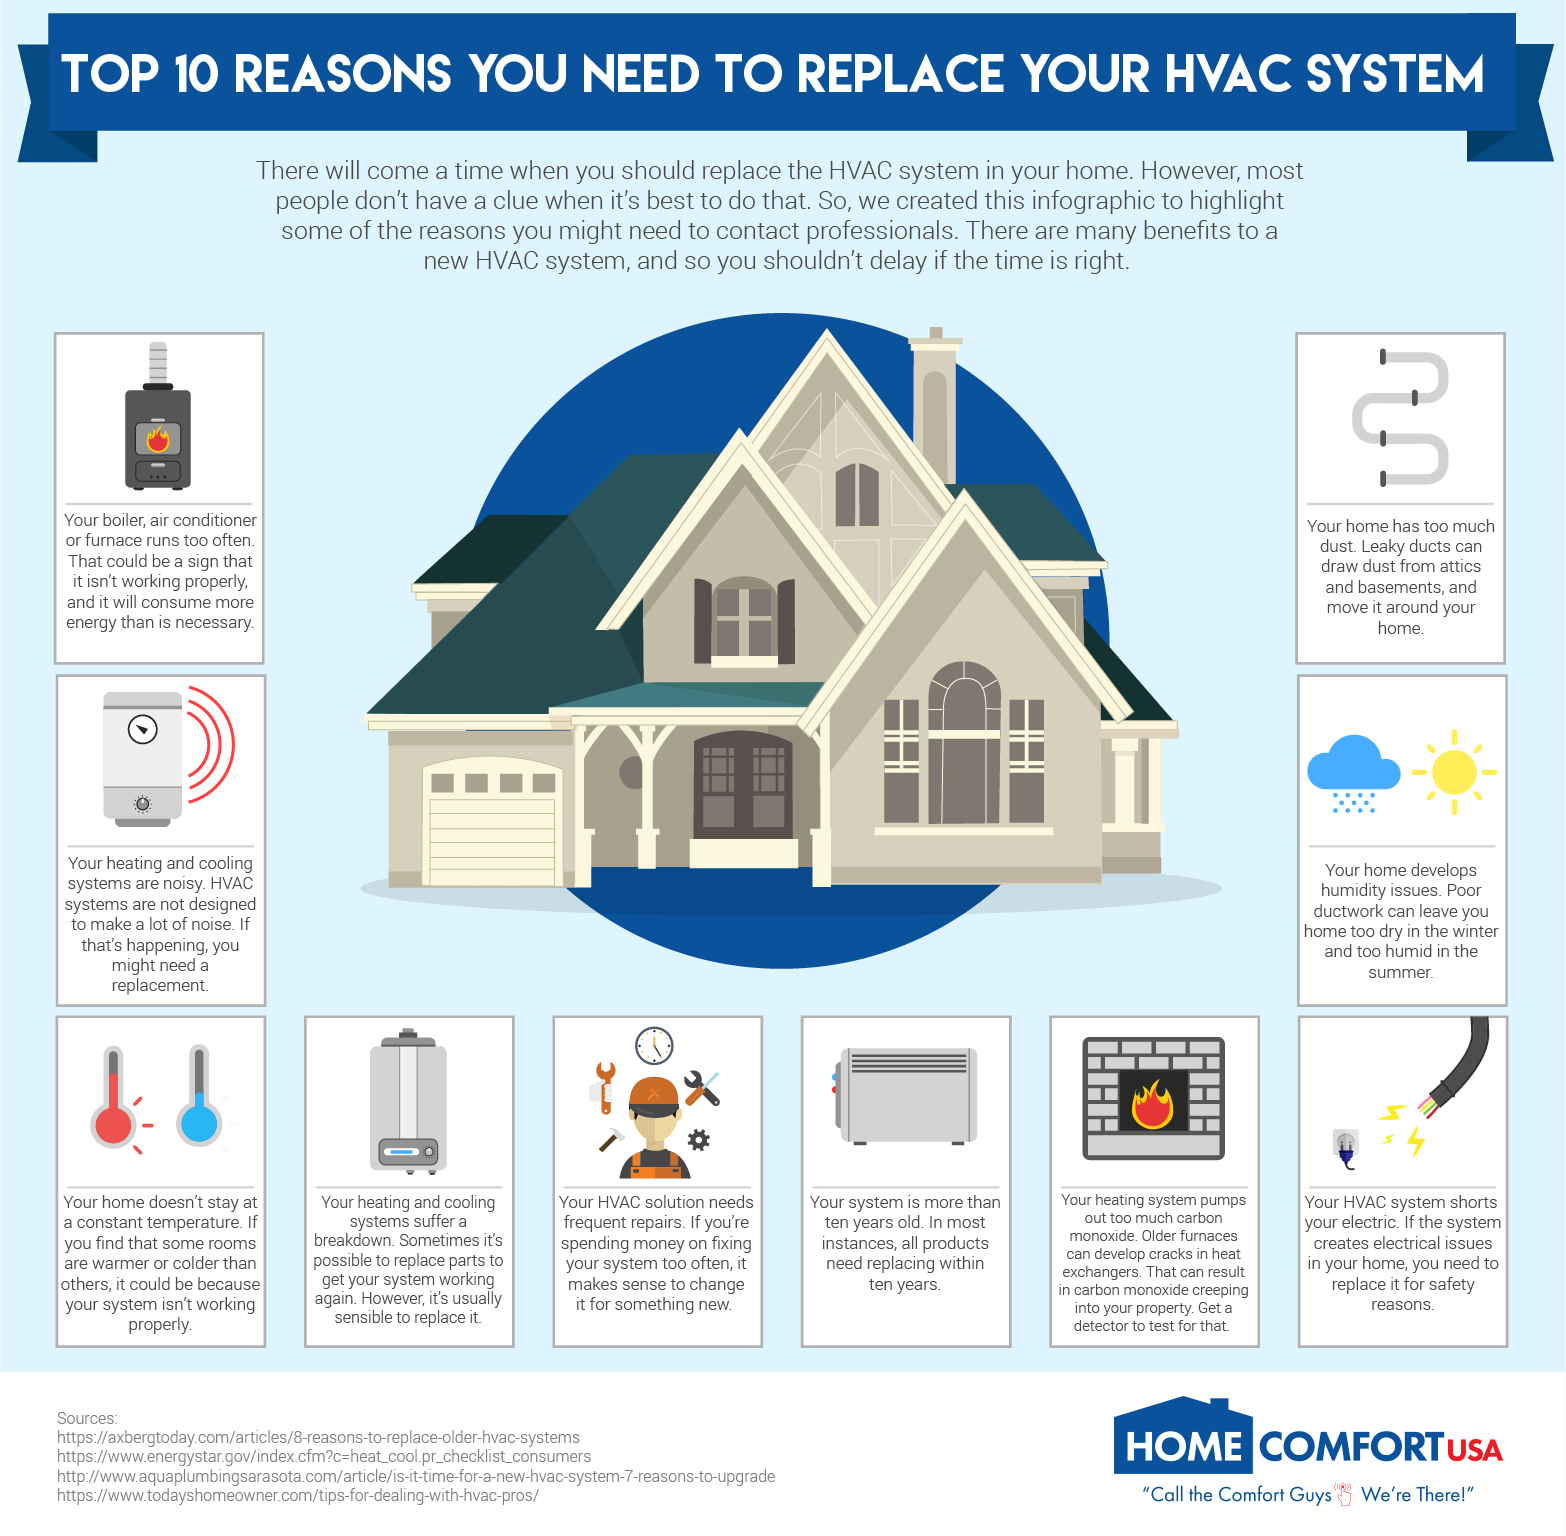 HVAC System infographic